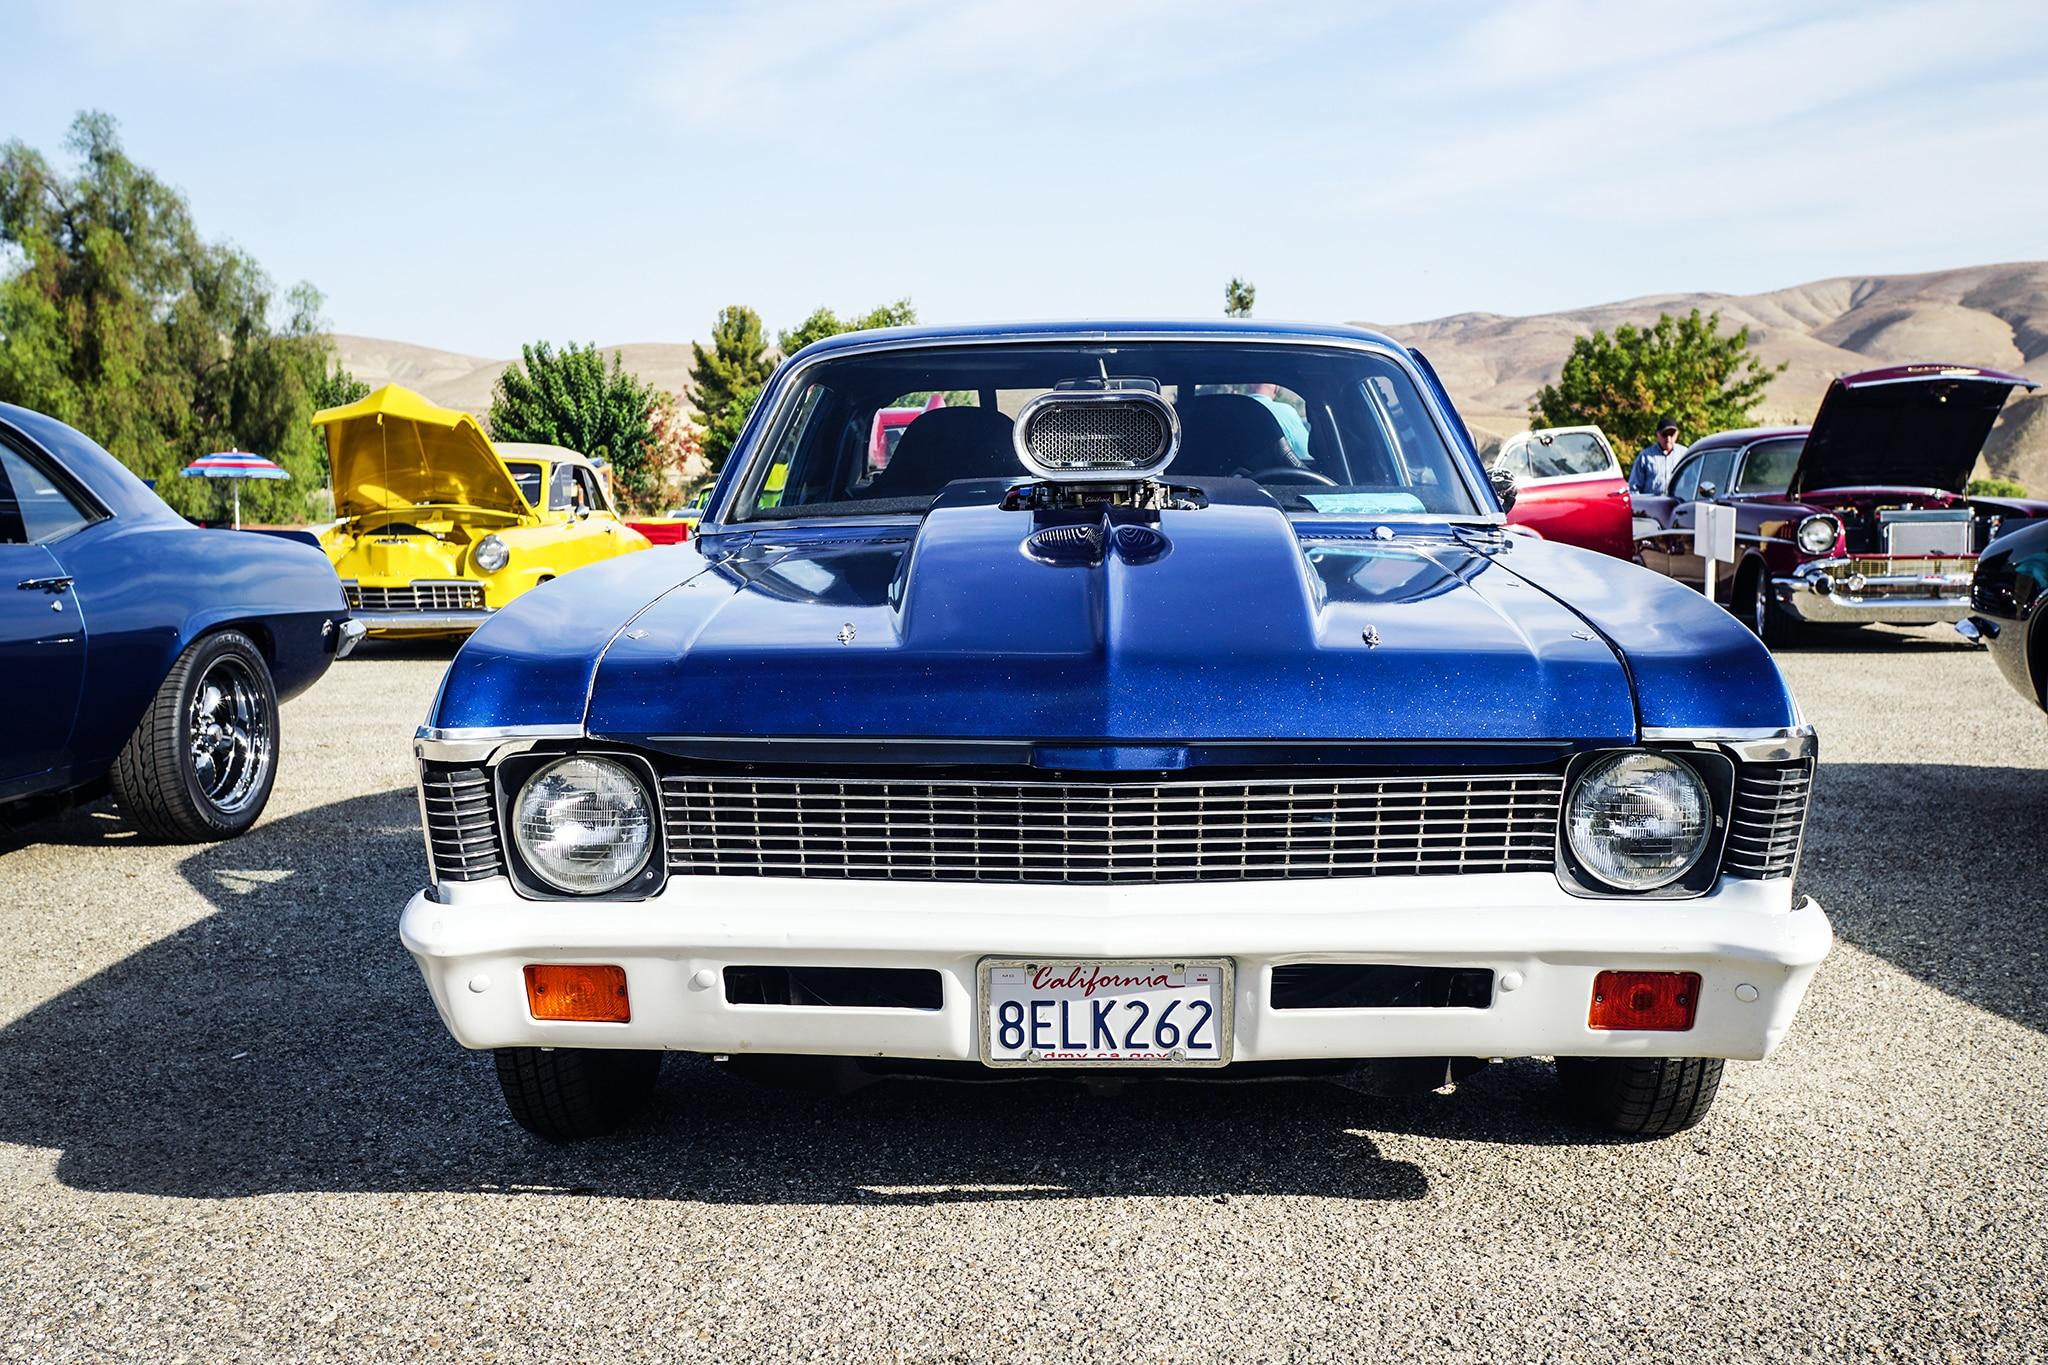 Chevy Classic Club Th Annual Car Show Automobile Magazine - Car show pics